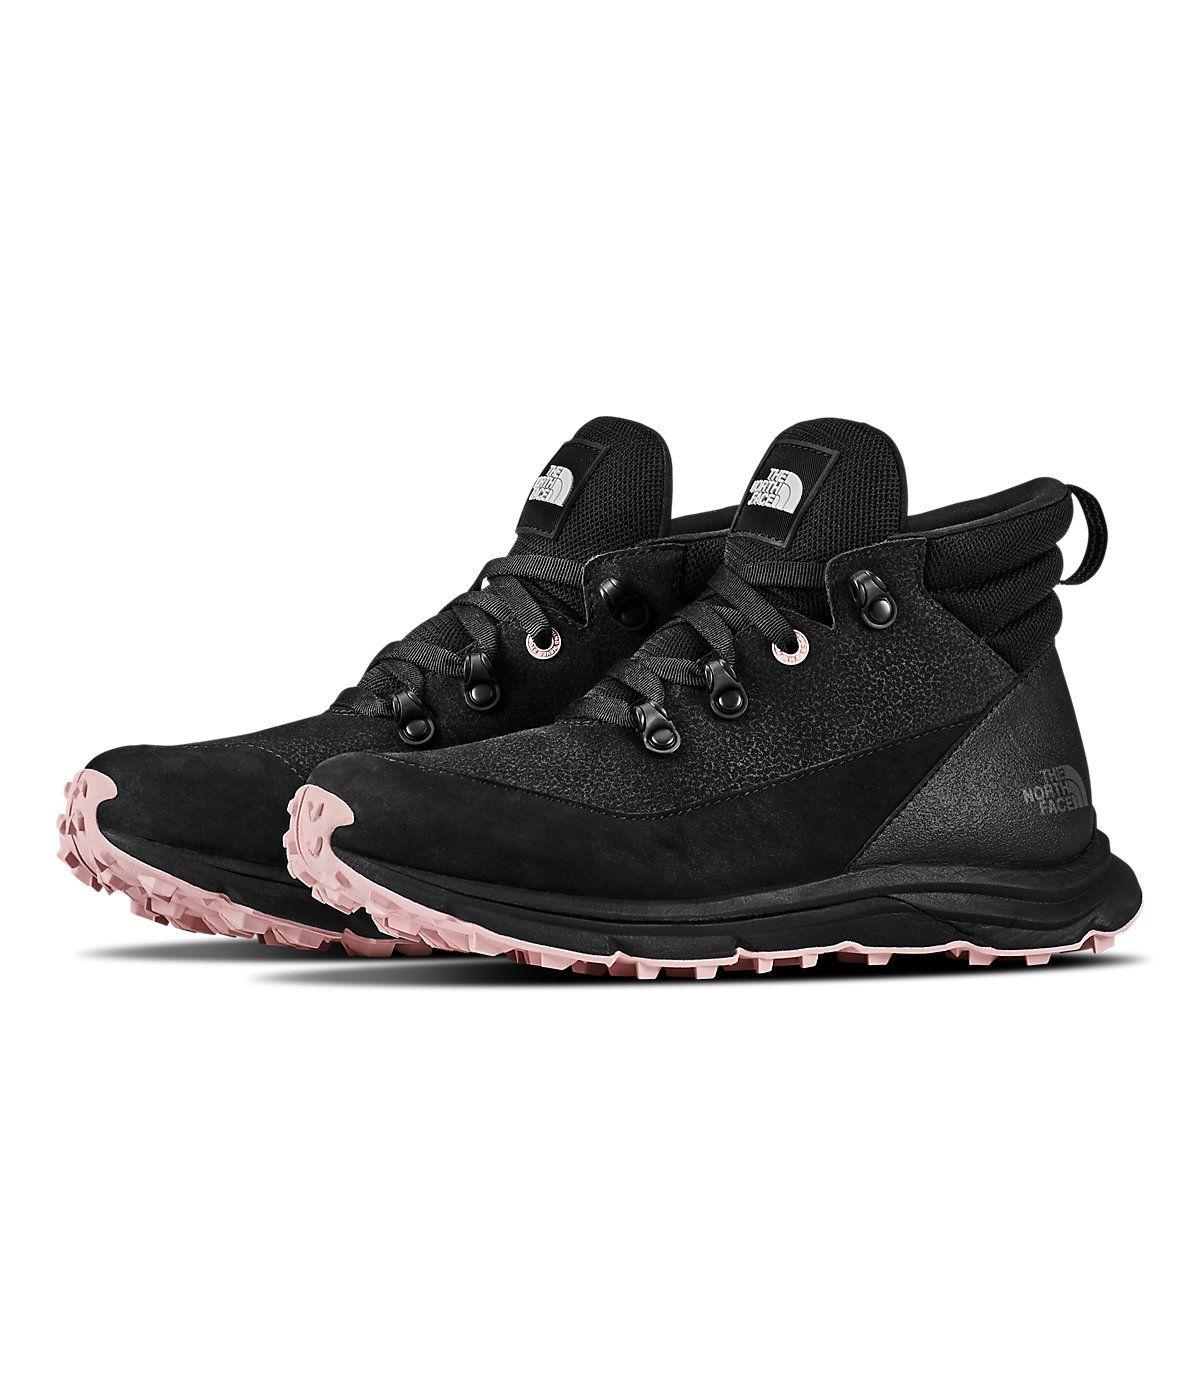 Raedonda Boot Sneakers | Sneaker boots